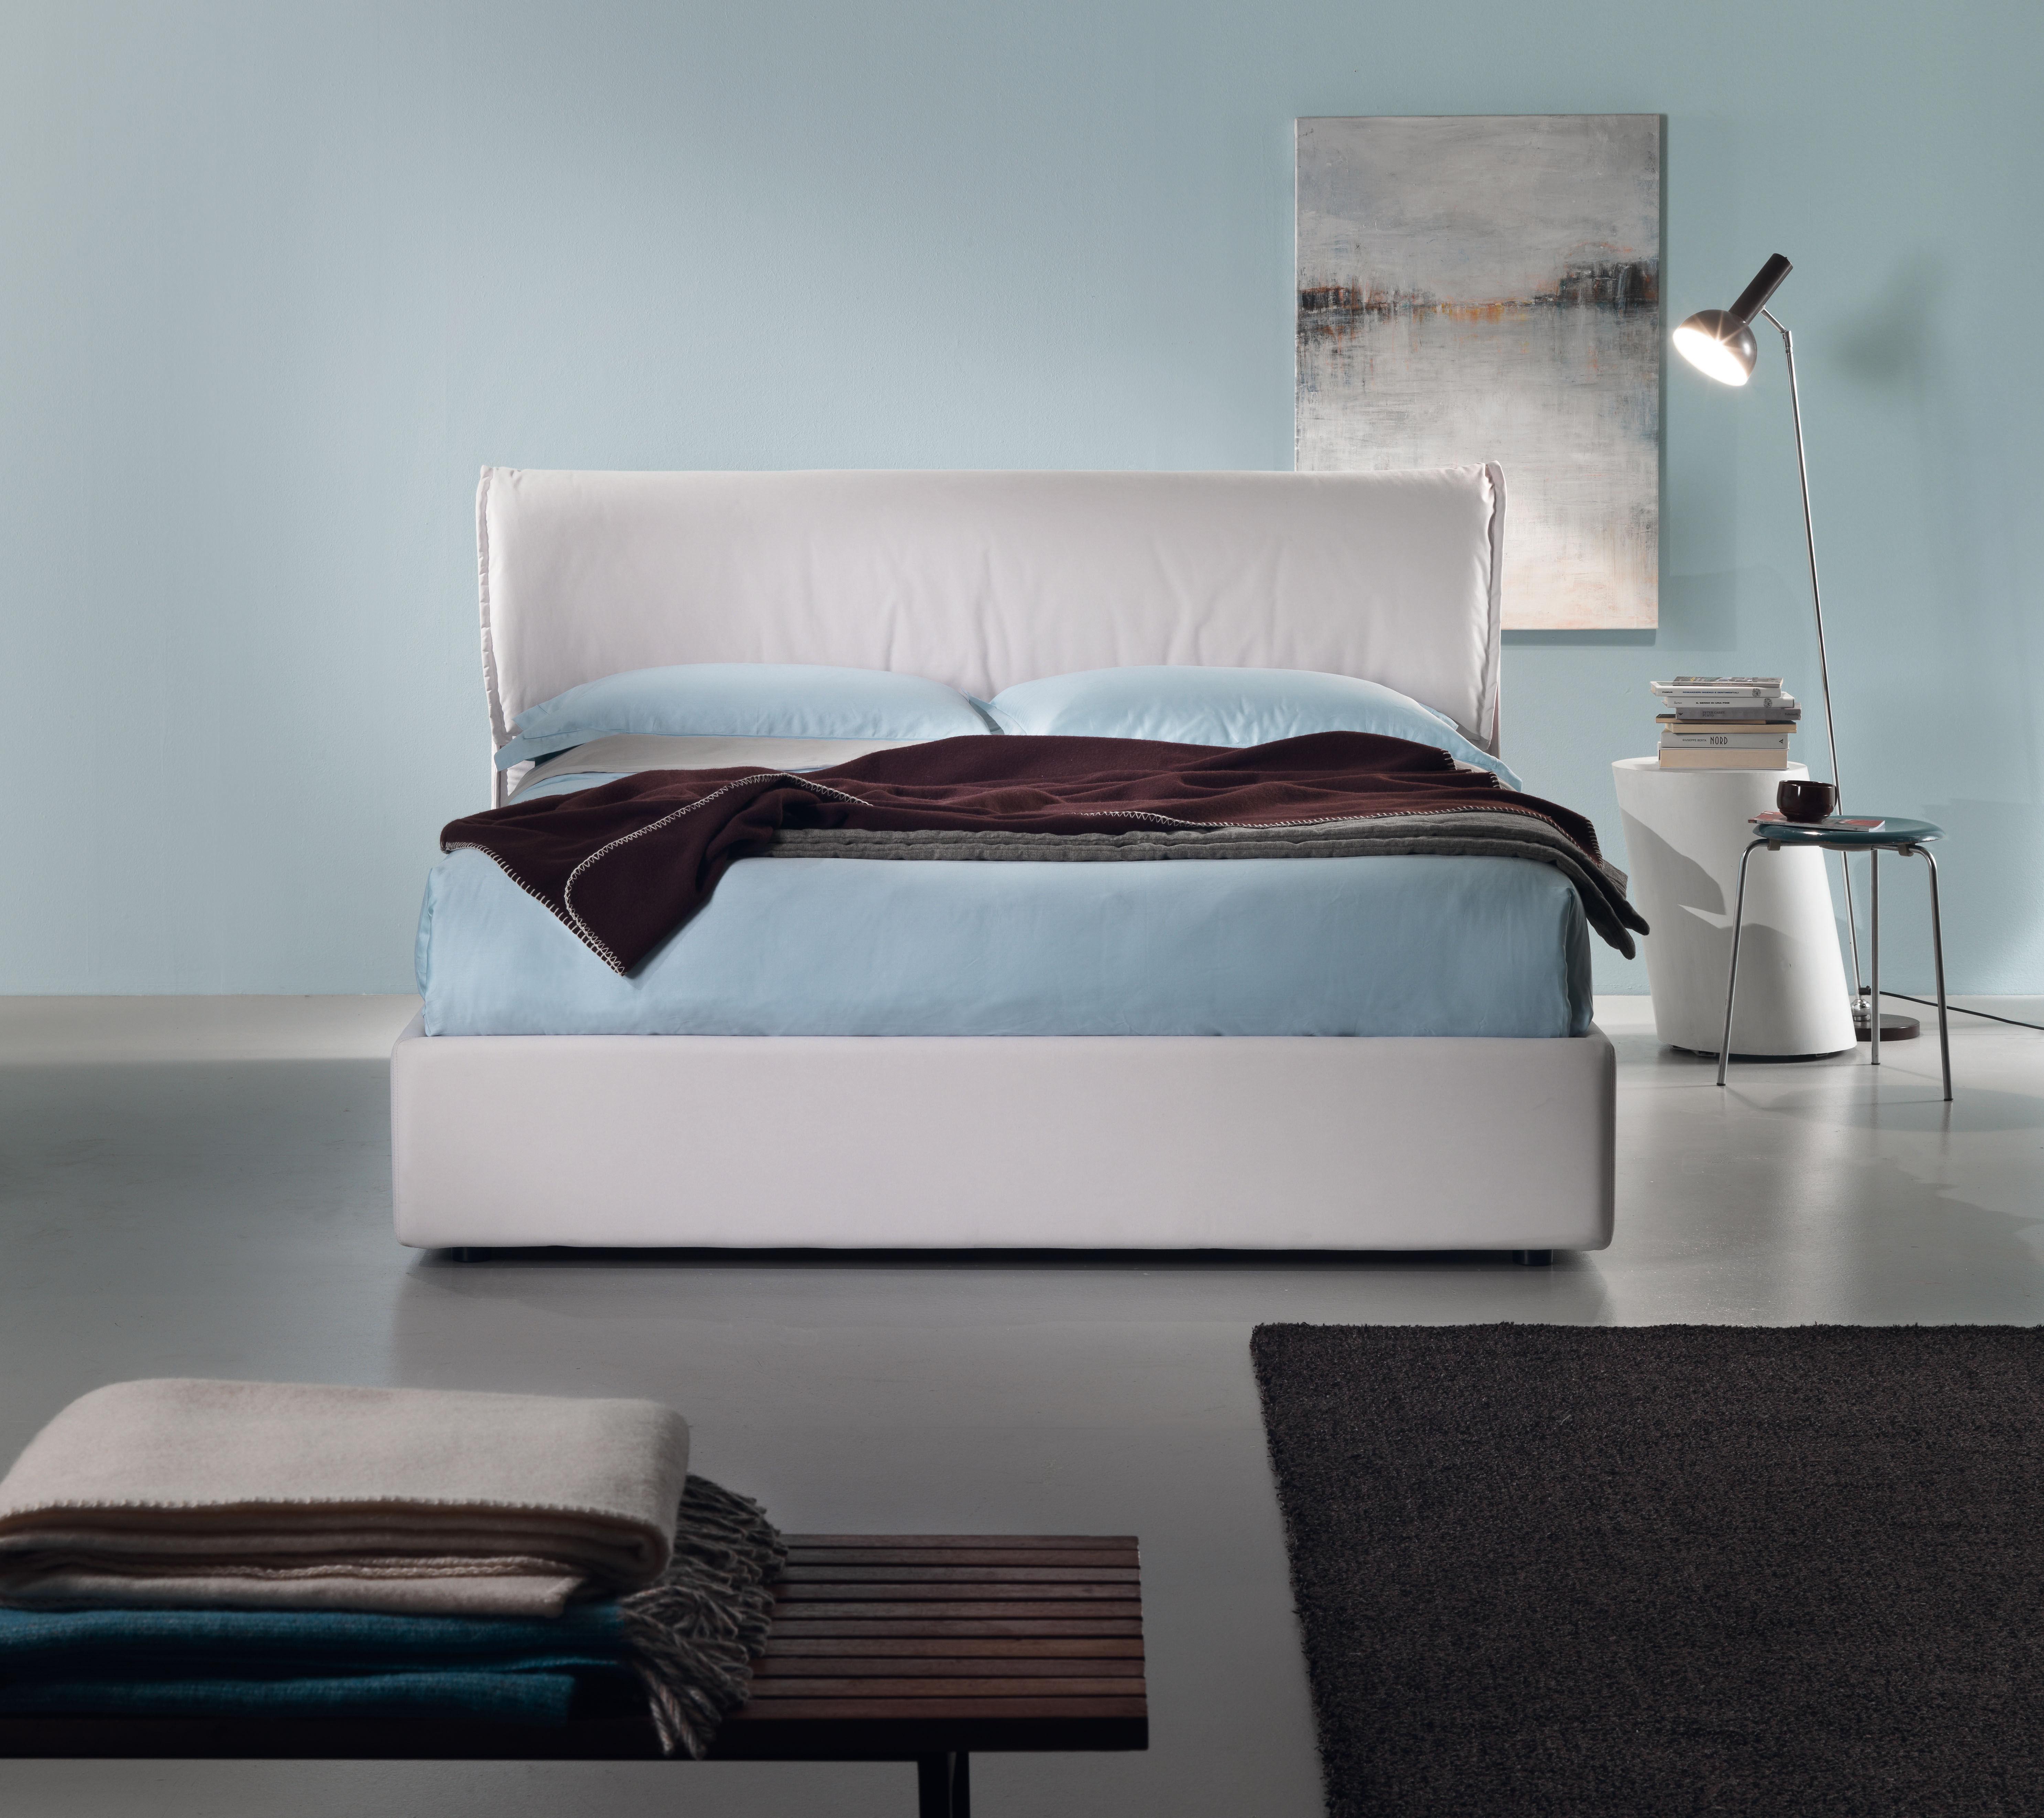 lit double hollis 216 x 180 cm beige dorelan. Black Bedroom Furniture Sets. Home Design Ideas